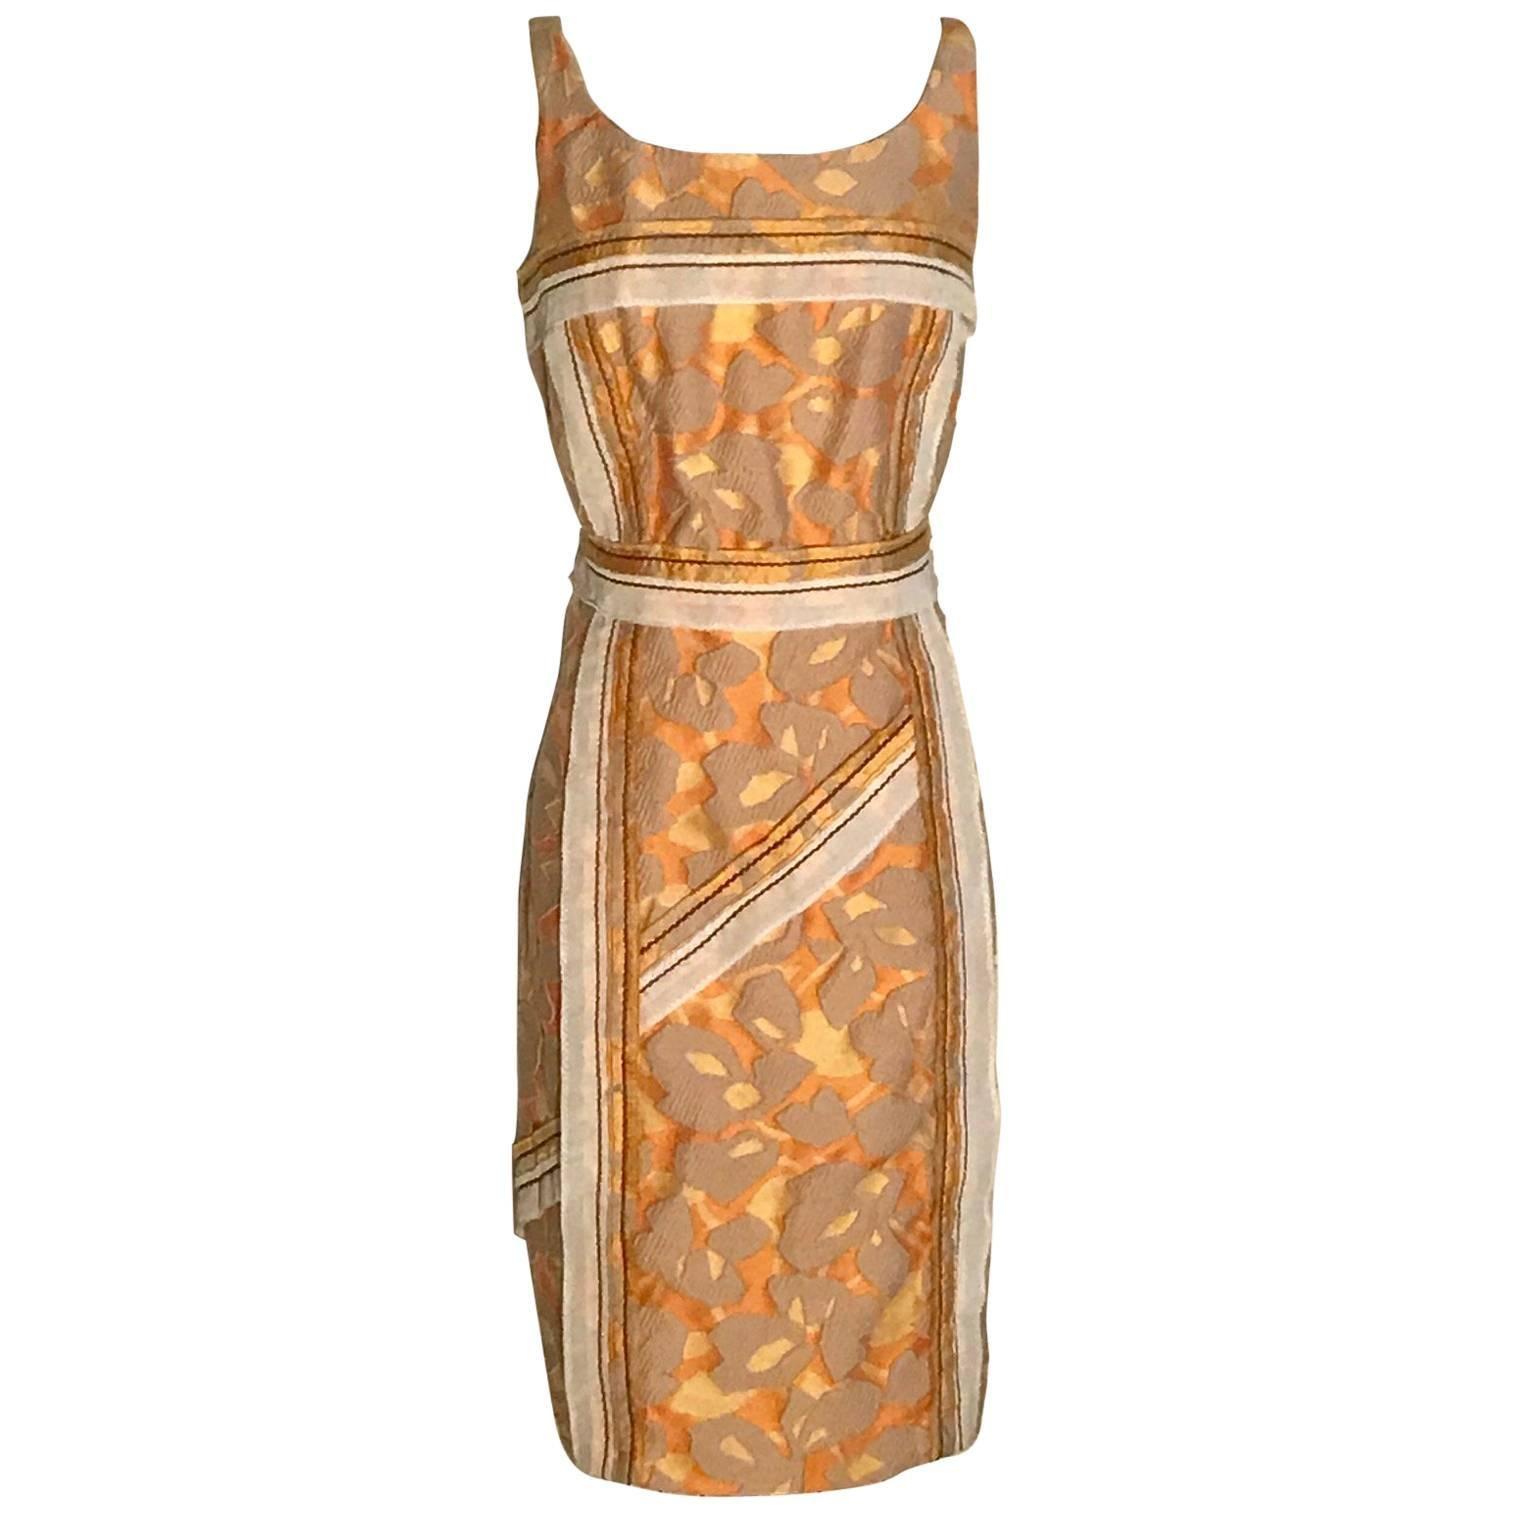 Prada 2015 Runway Yellow Orange Abstract Print Jacquard Dress with Trim Detail